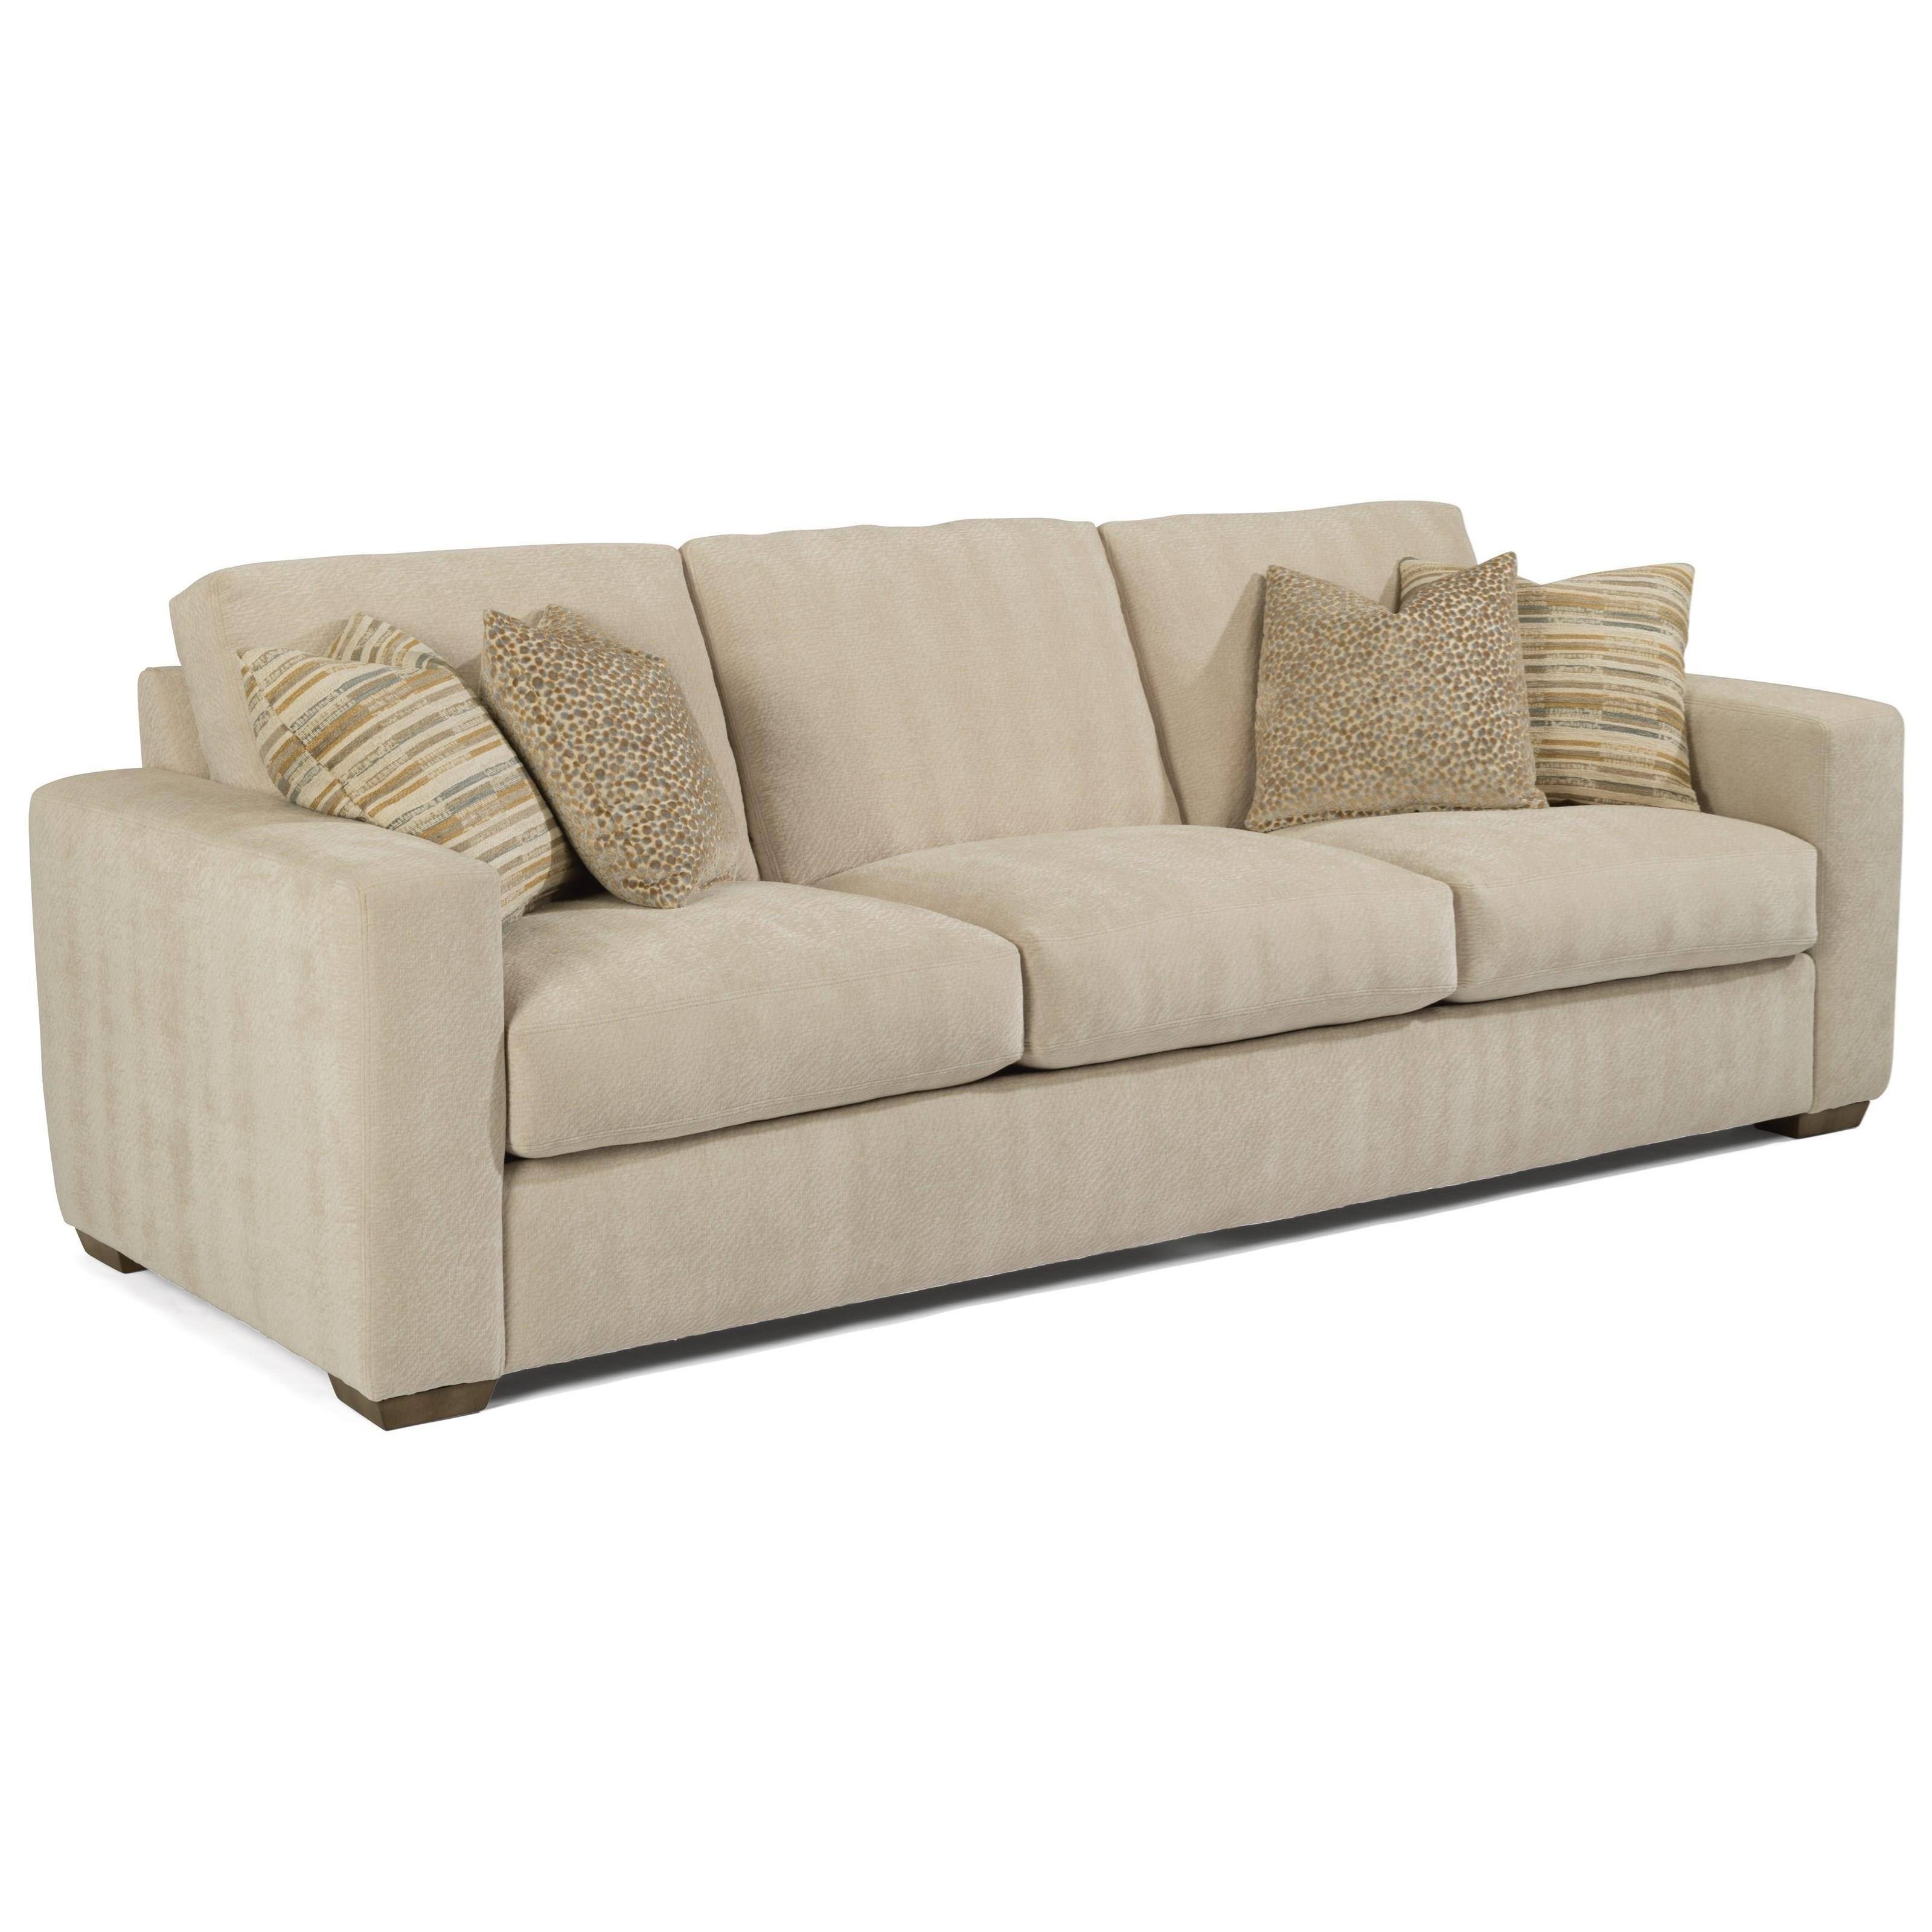 "Collins 104"" Three-Cushion Sofa by Flexsteel at Mueller Furniture"